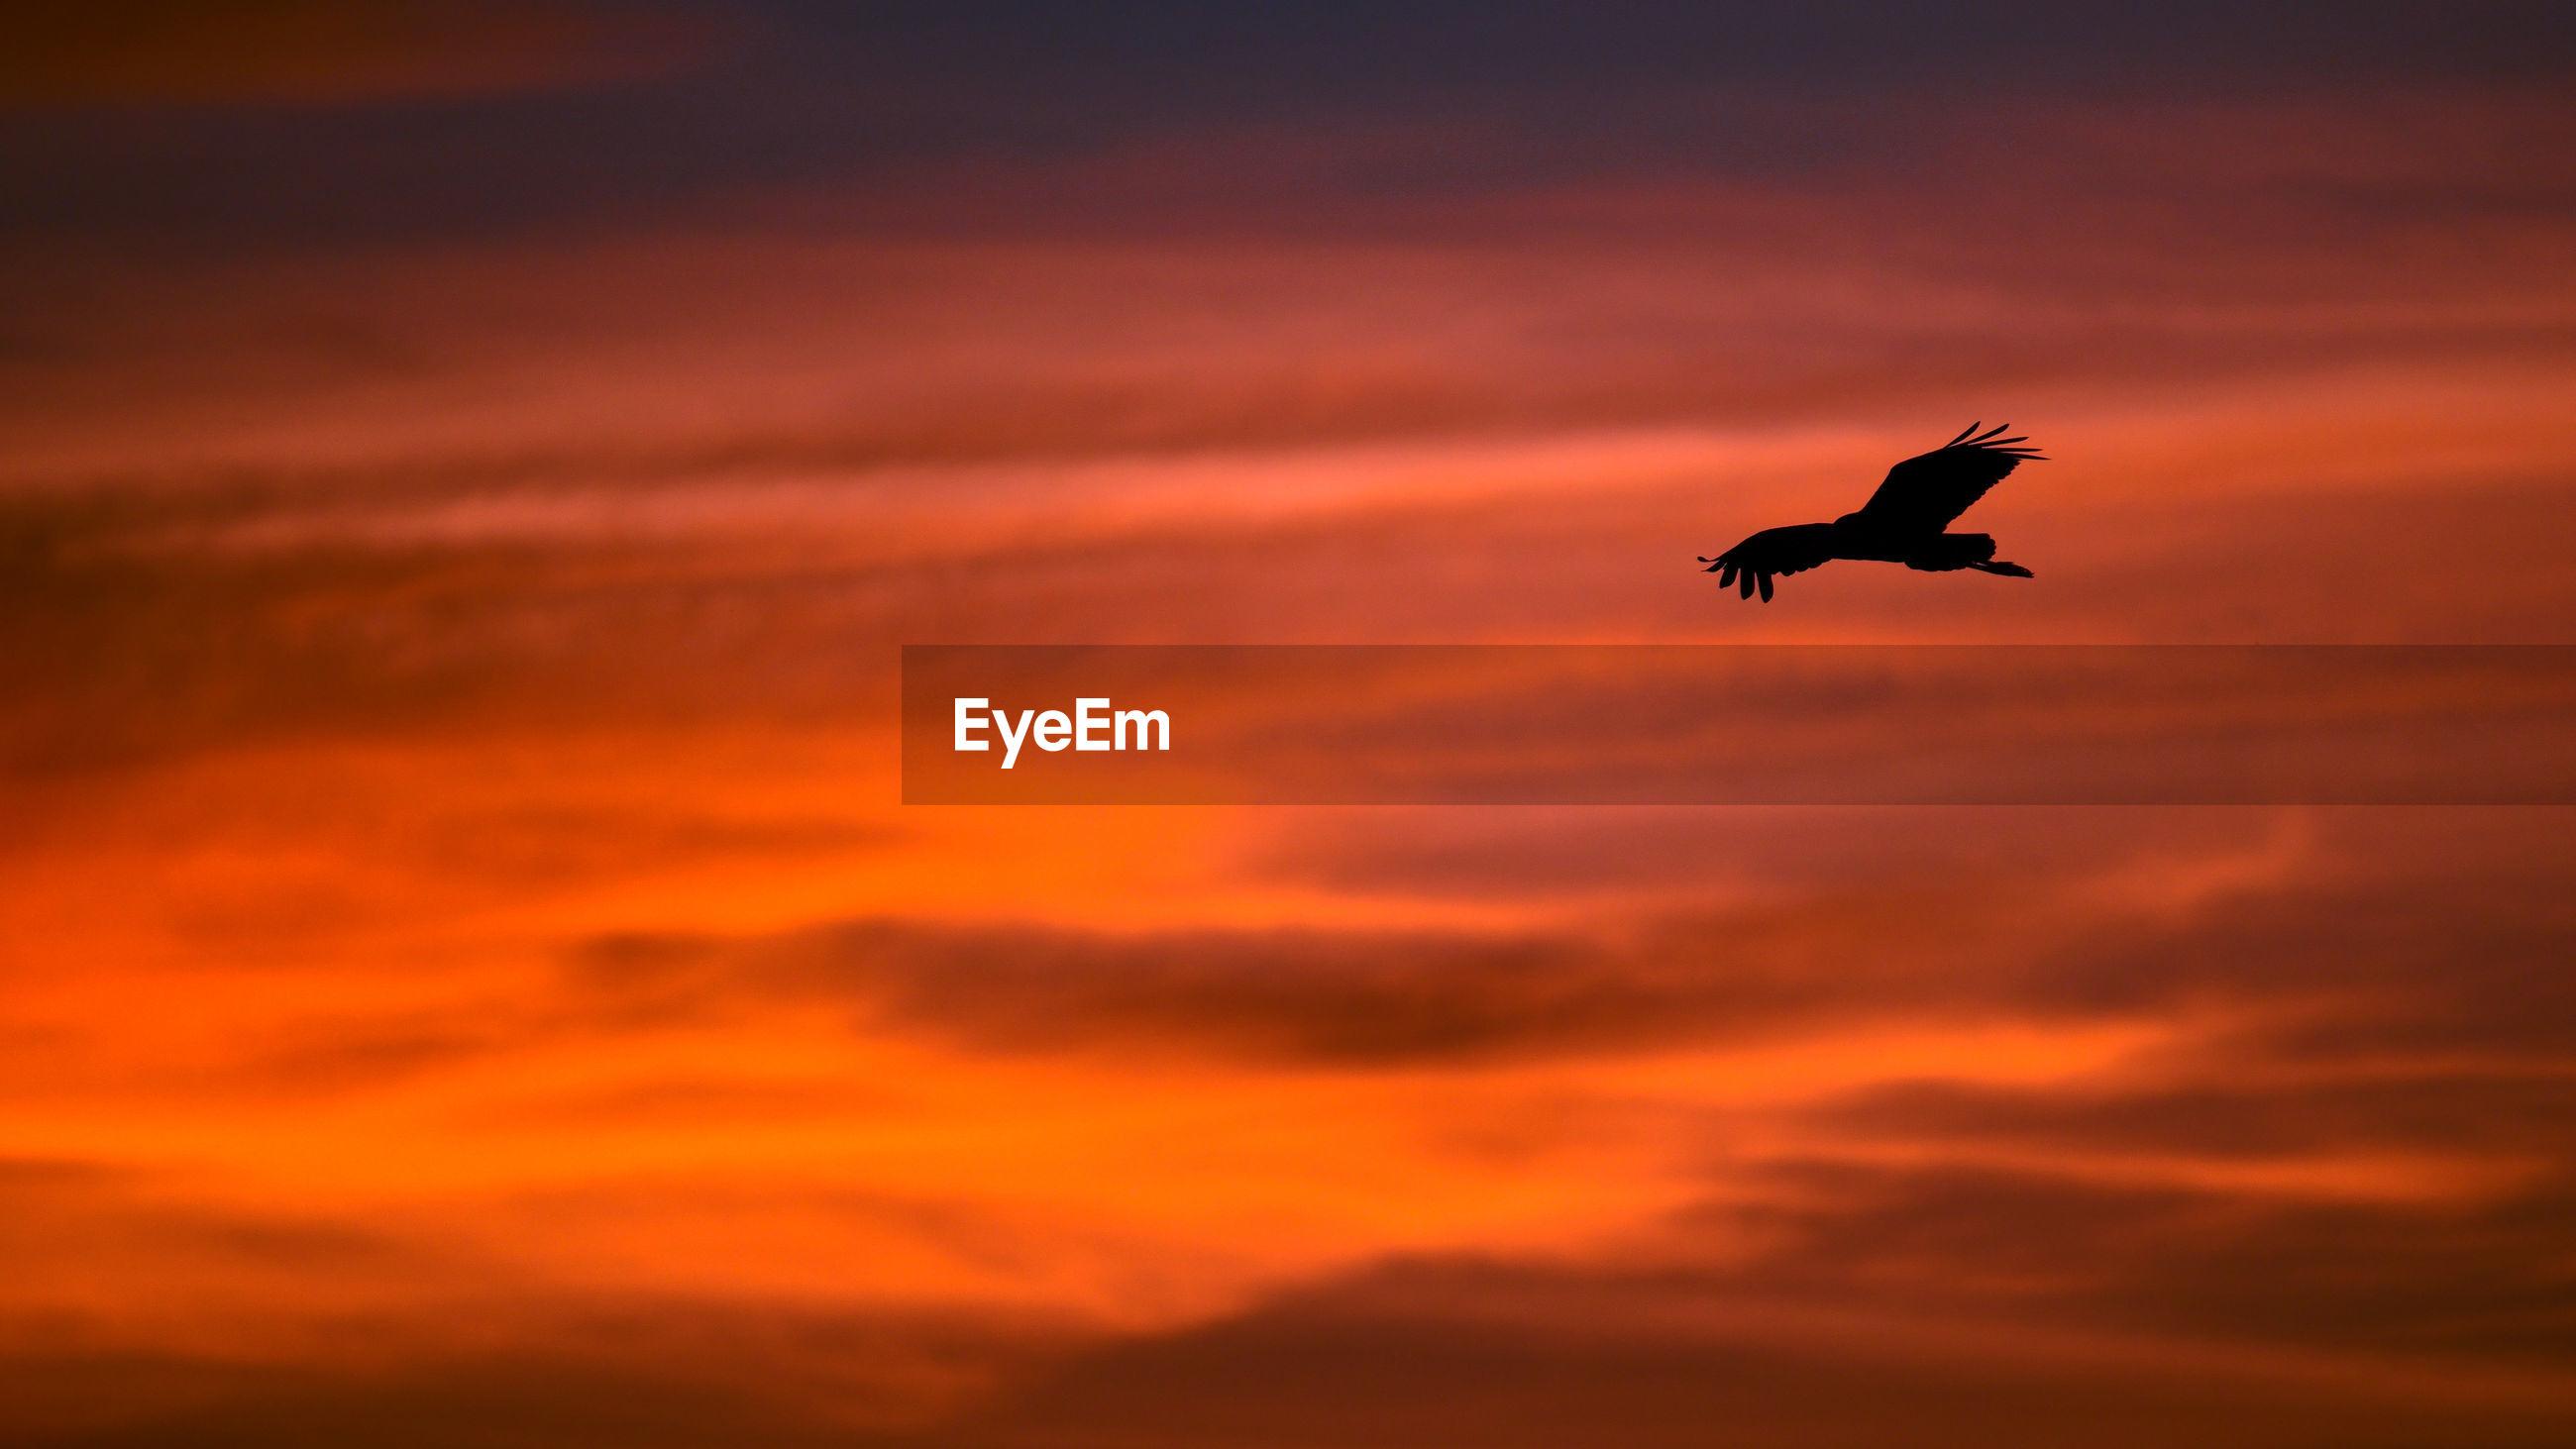 BIRD FLYING IN SKY